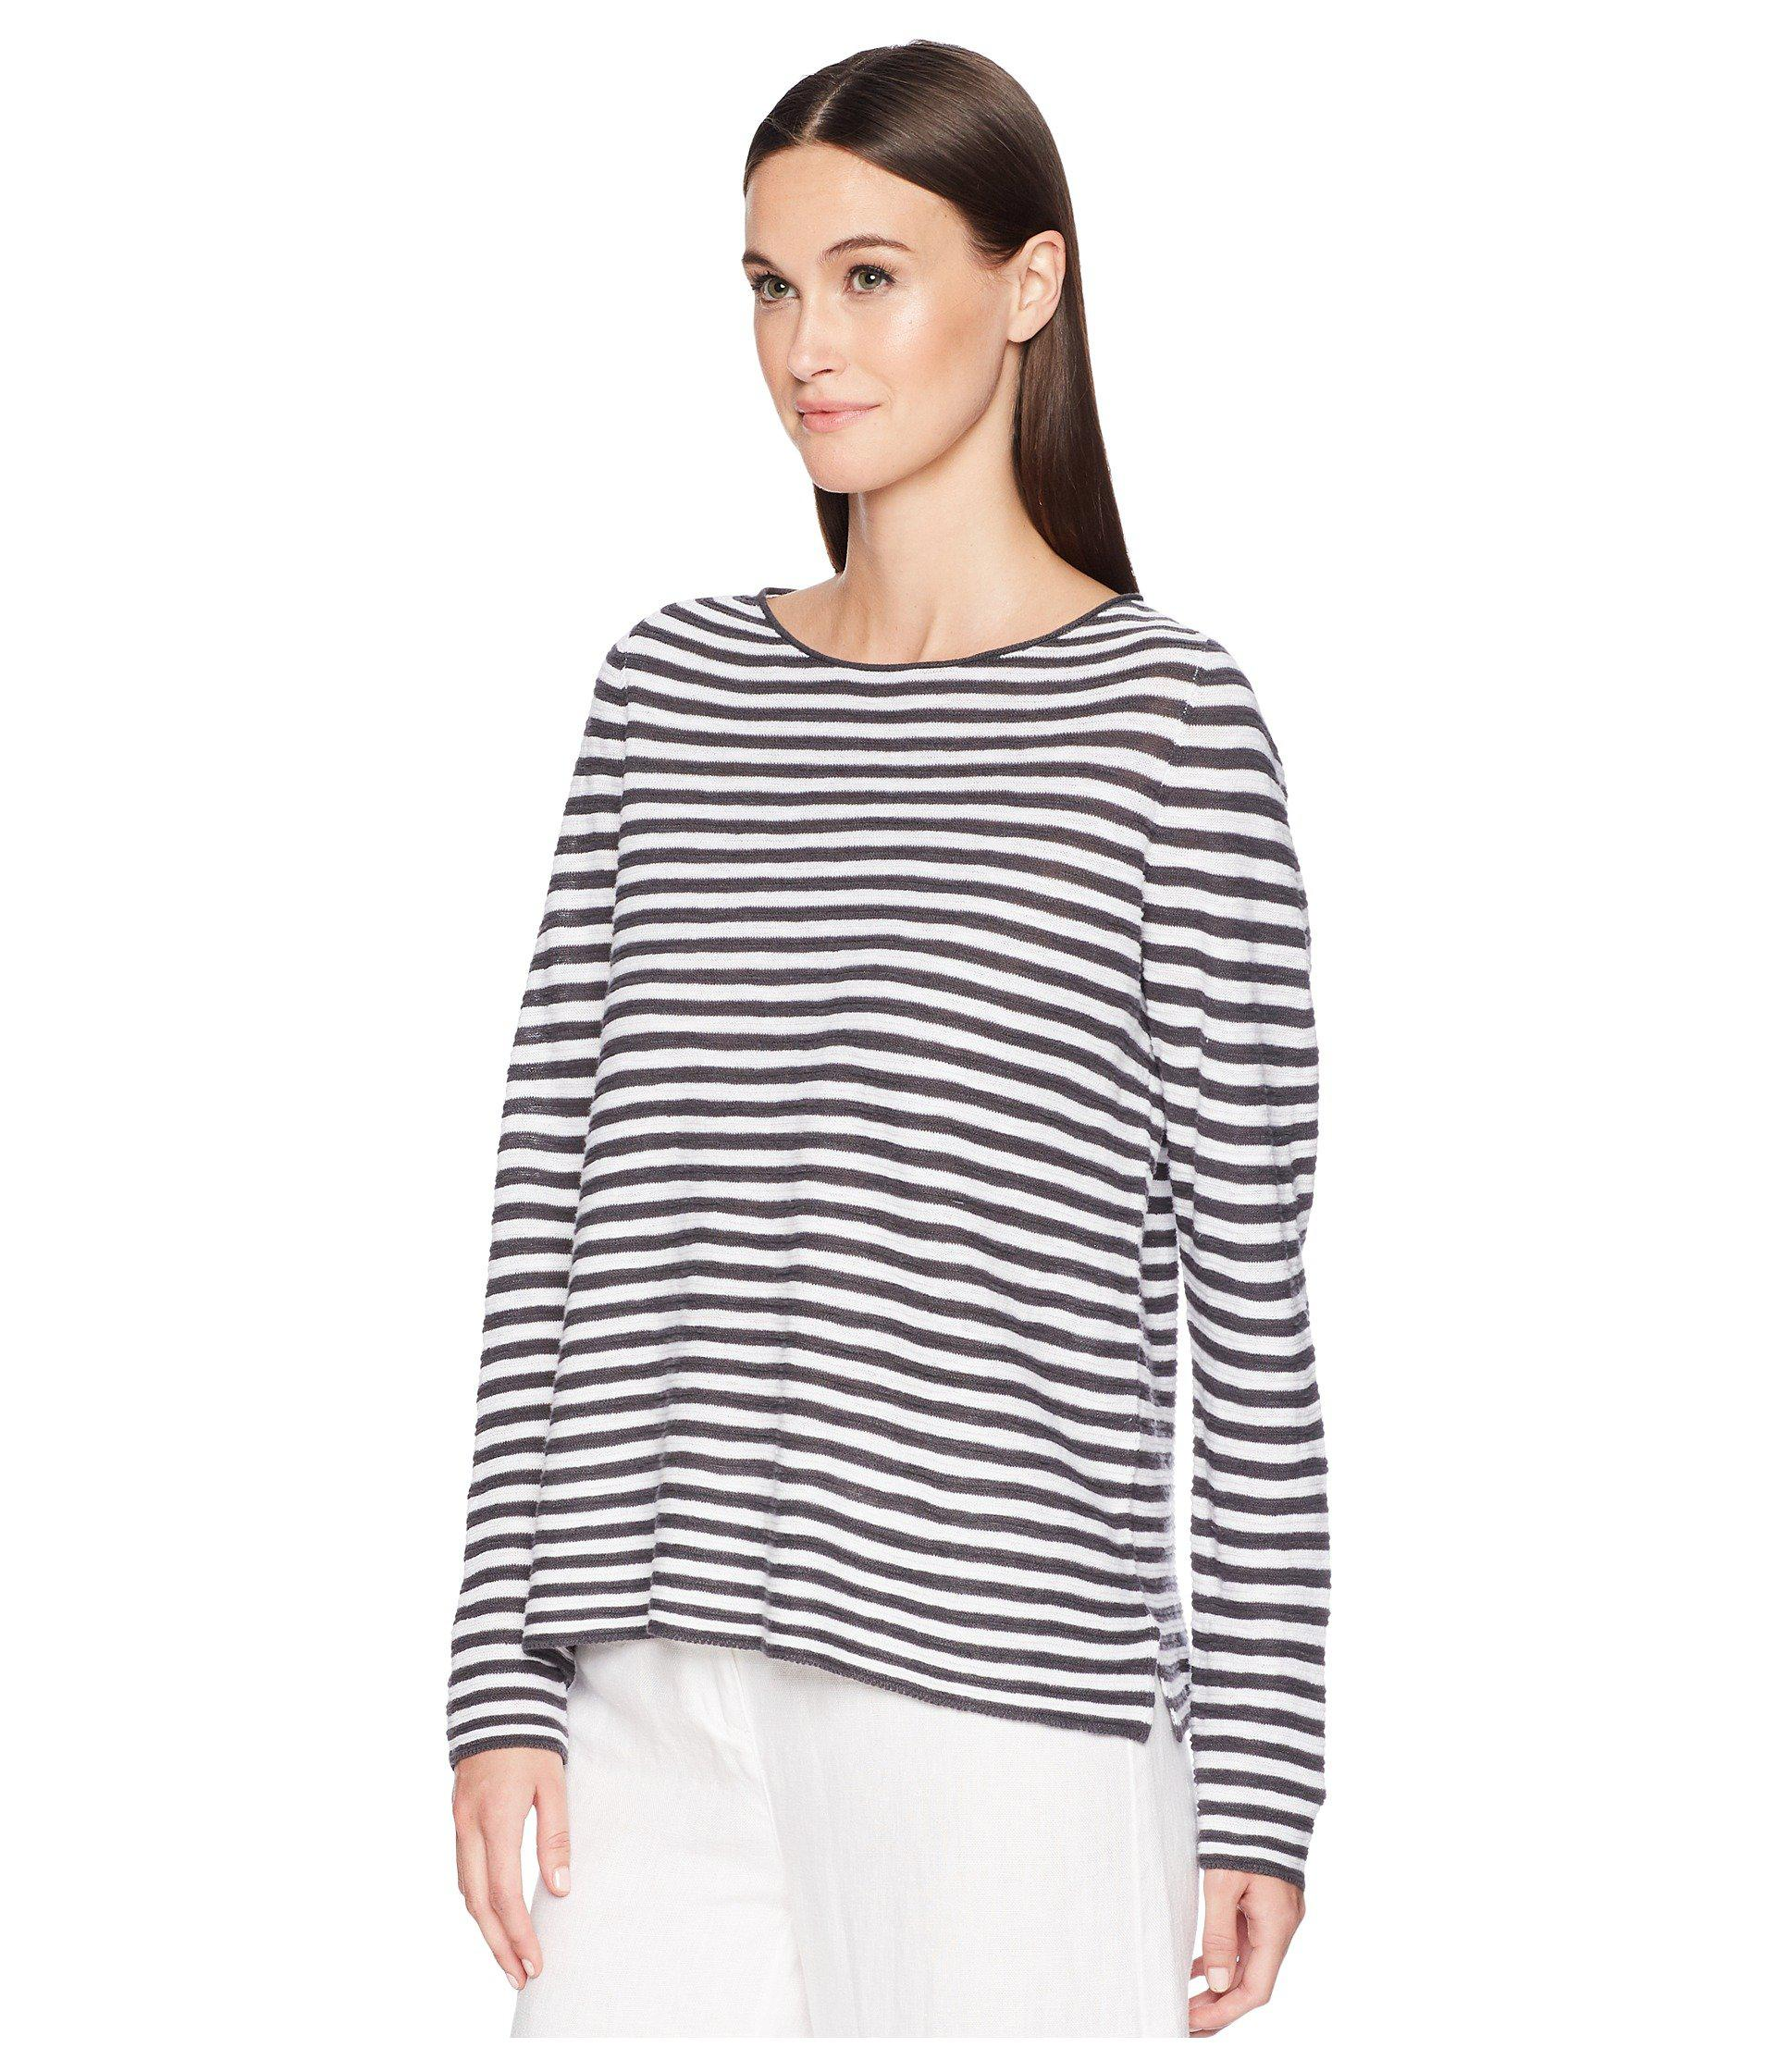 ab33f228ed0 Eileen Fisher Organic Linen Cotton Stripe Top - Save 23% - Lyst